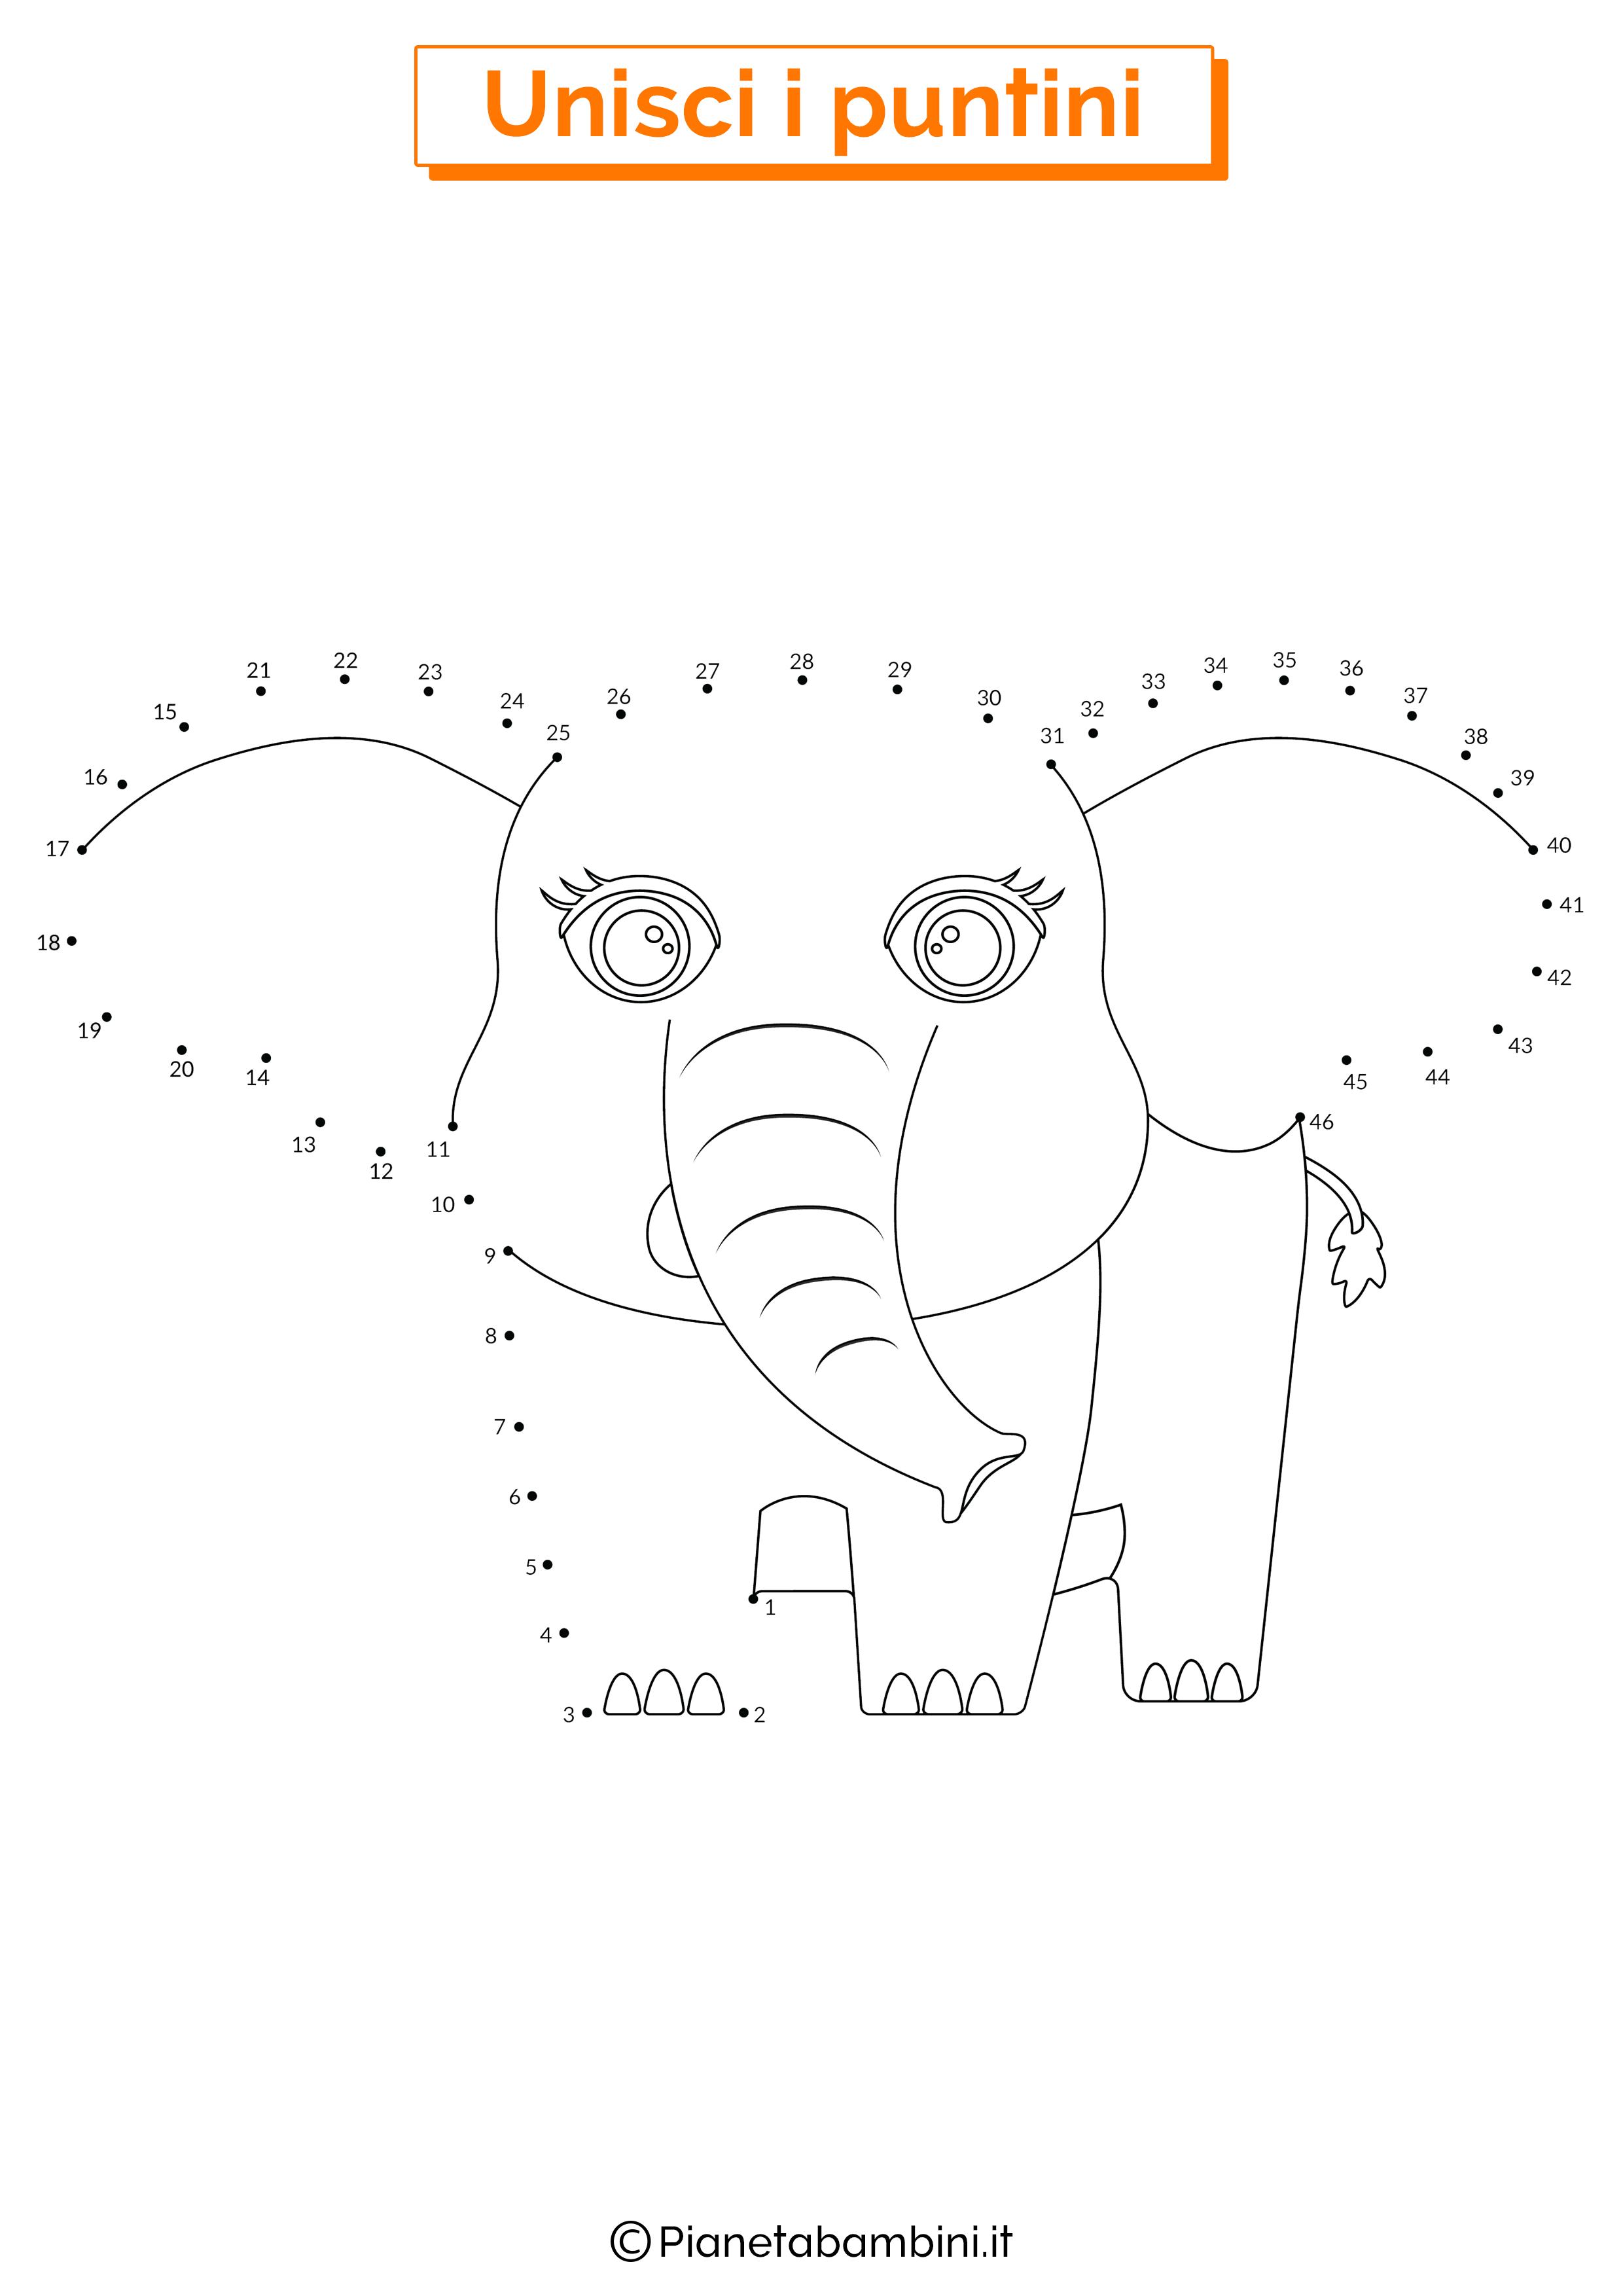 Disegno unisci i puntini da 1 a 50 elefante